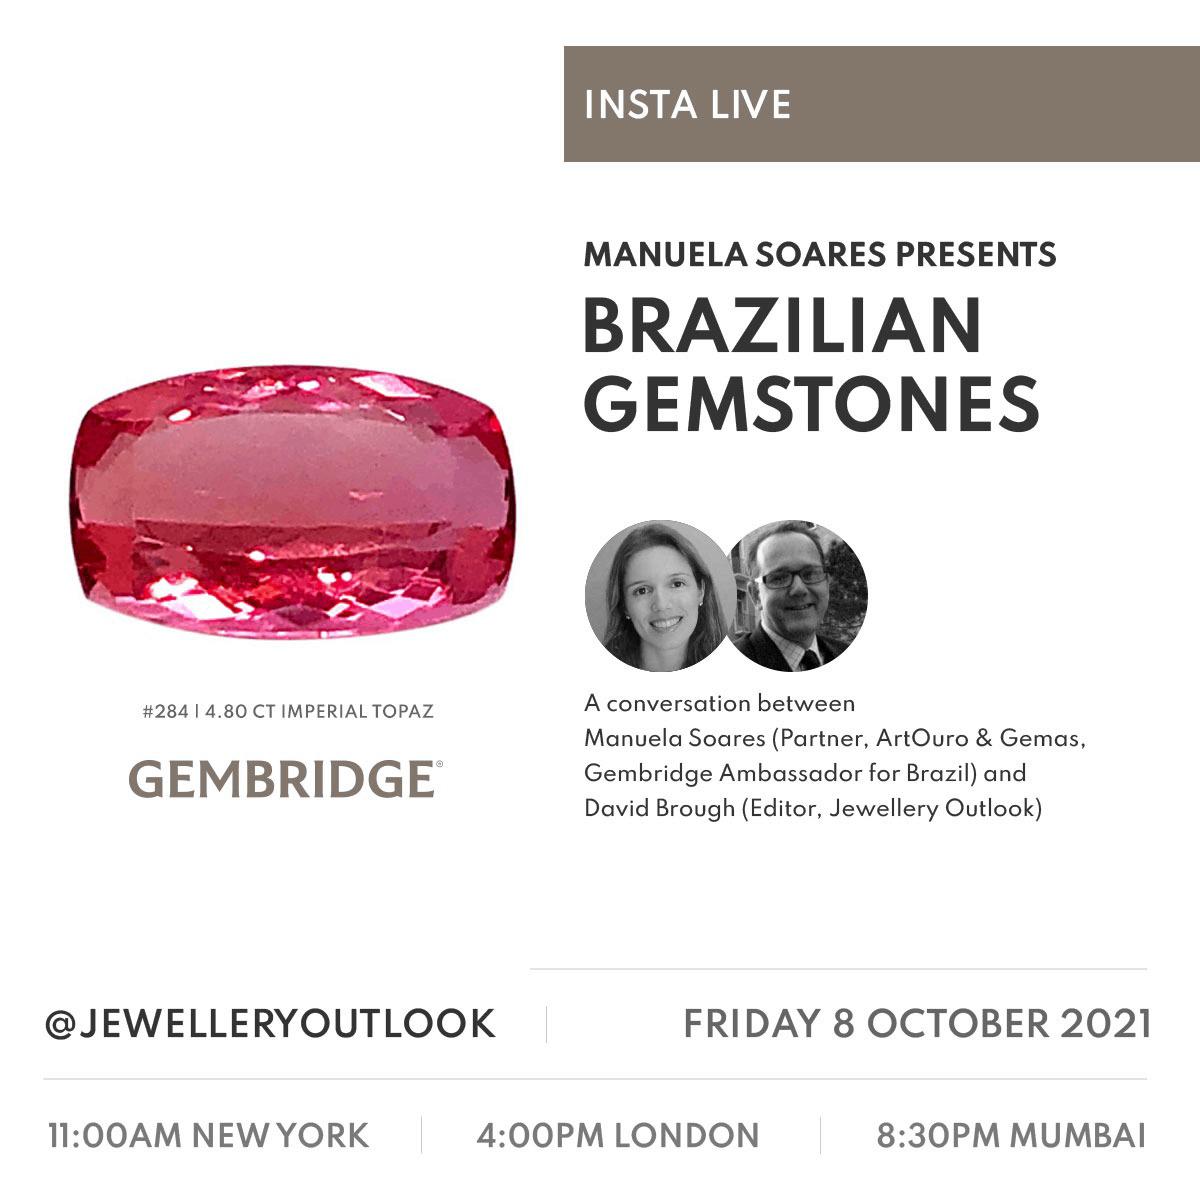 Insta Live - Brazilian Gemstones